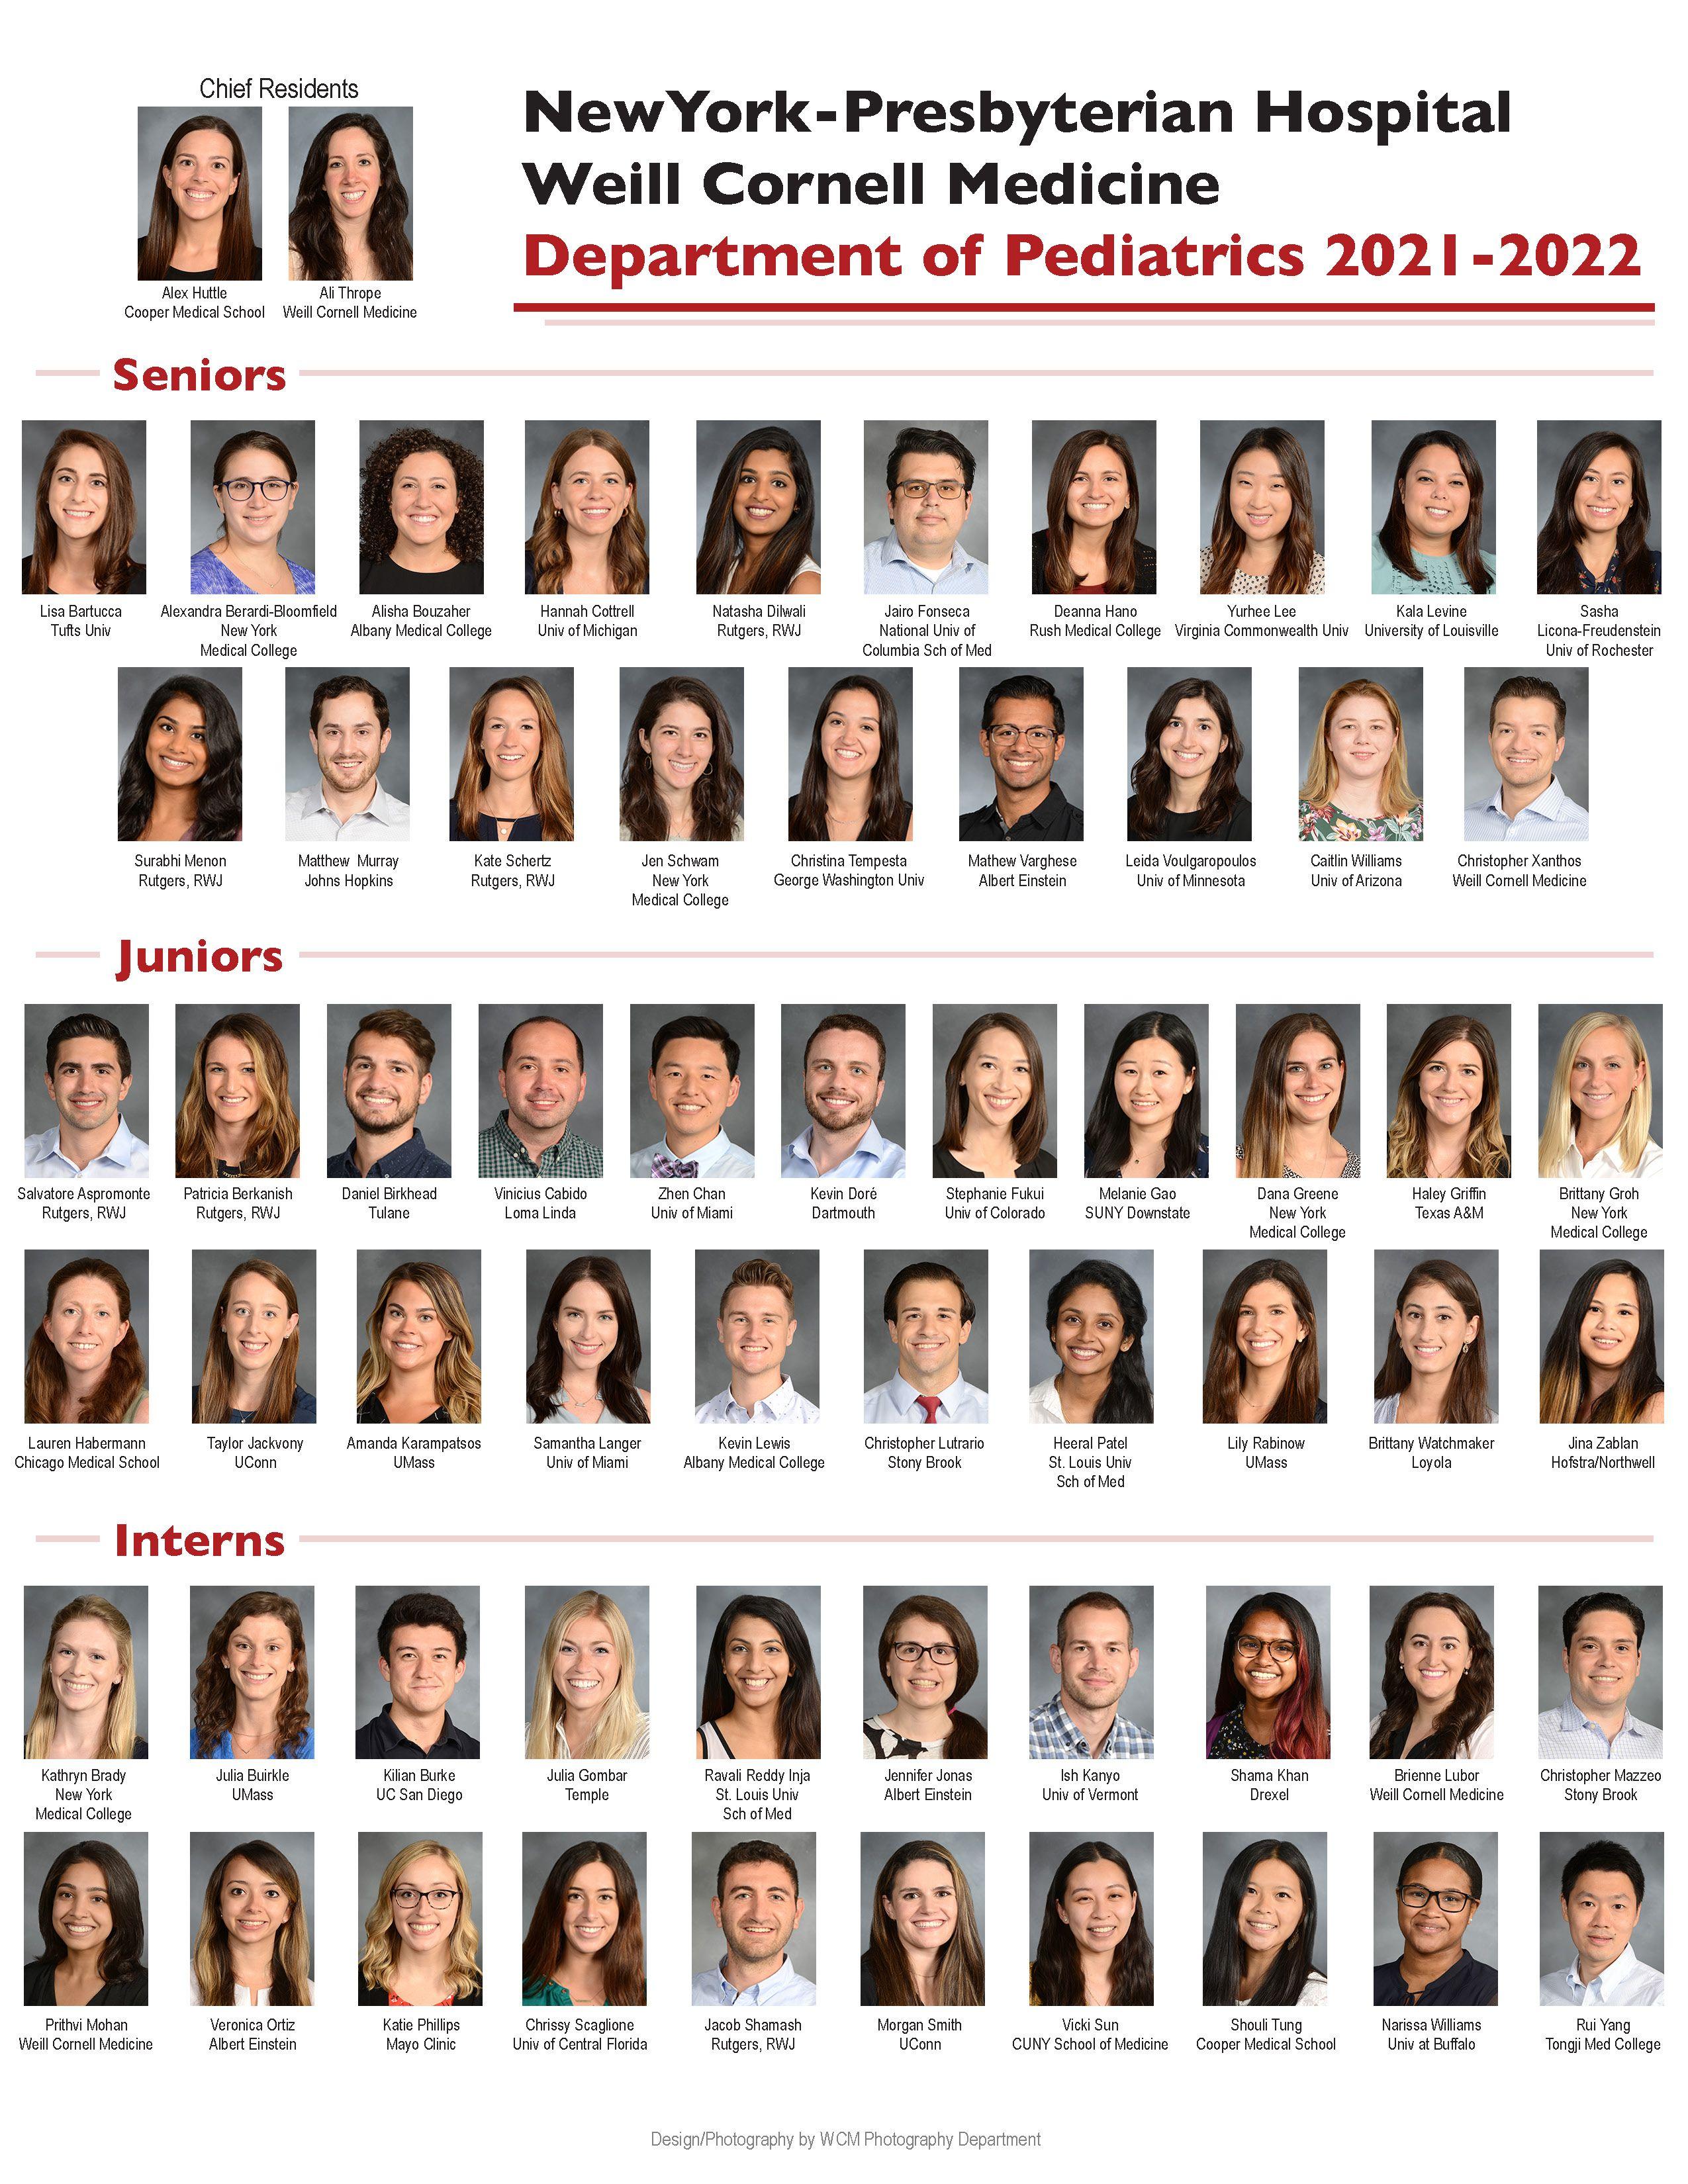 Composite of 2021-2022 Pediatrics Department residents